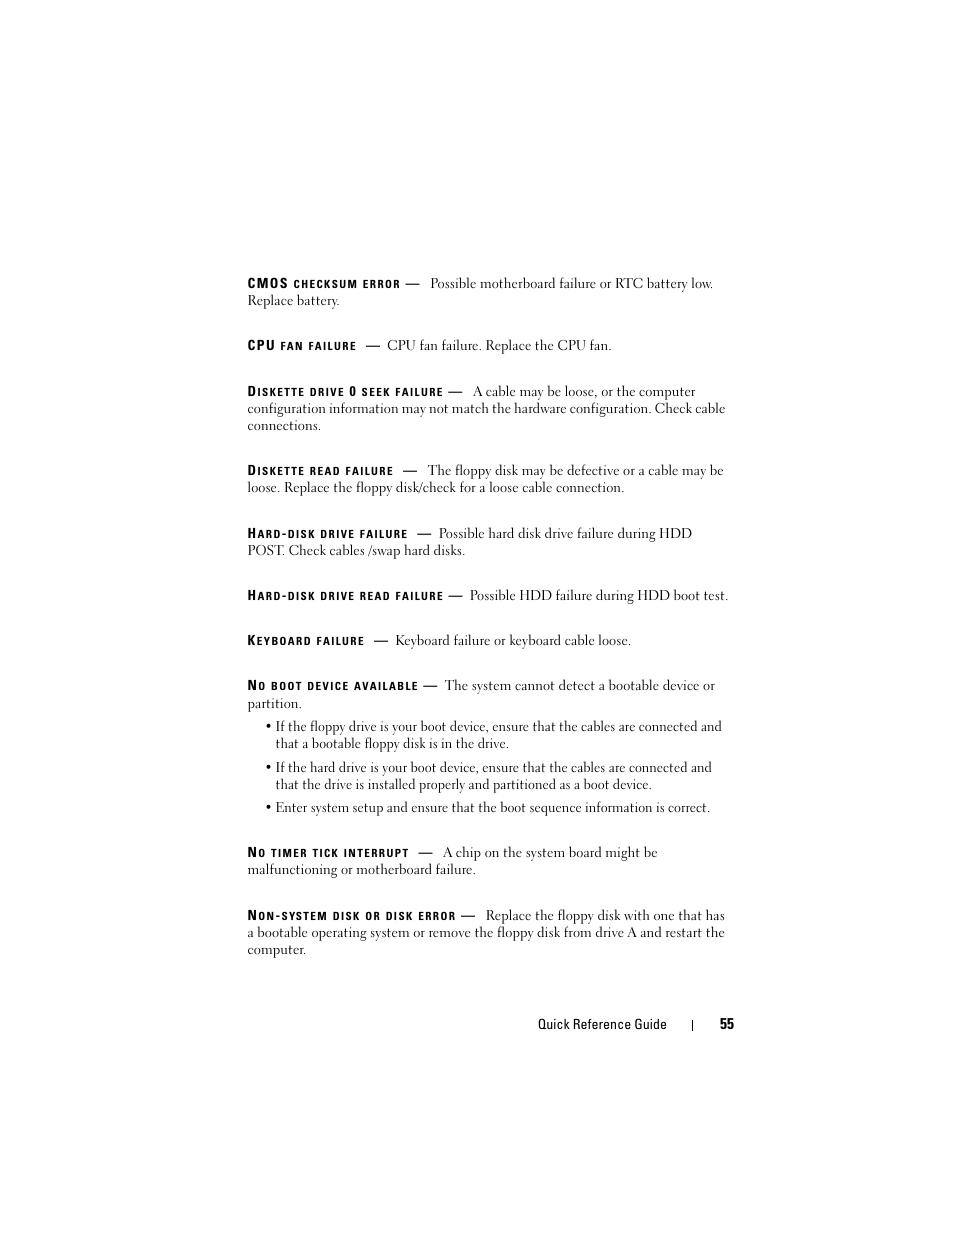 Инструкция по эксплуатации Dell OptiPlex 330 | Страница 55 / 544